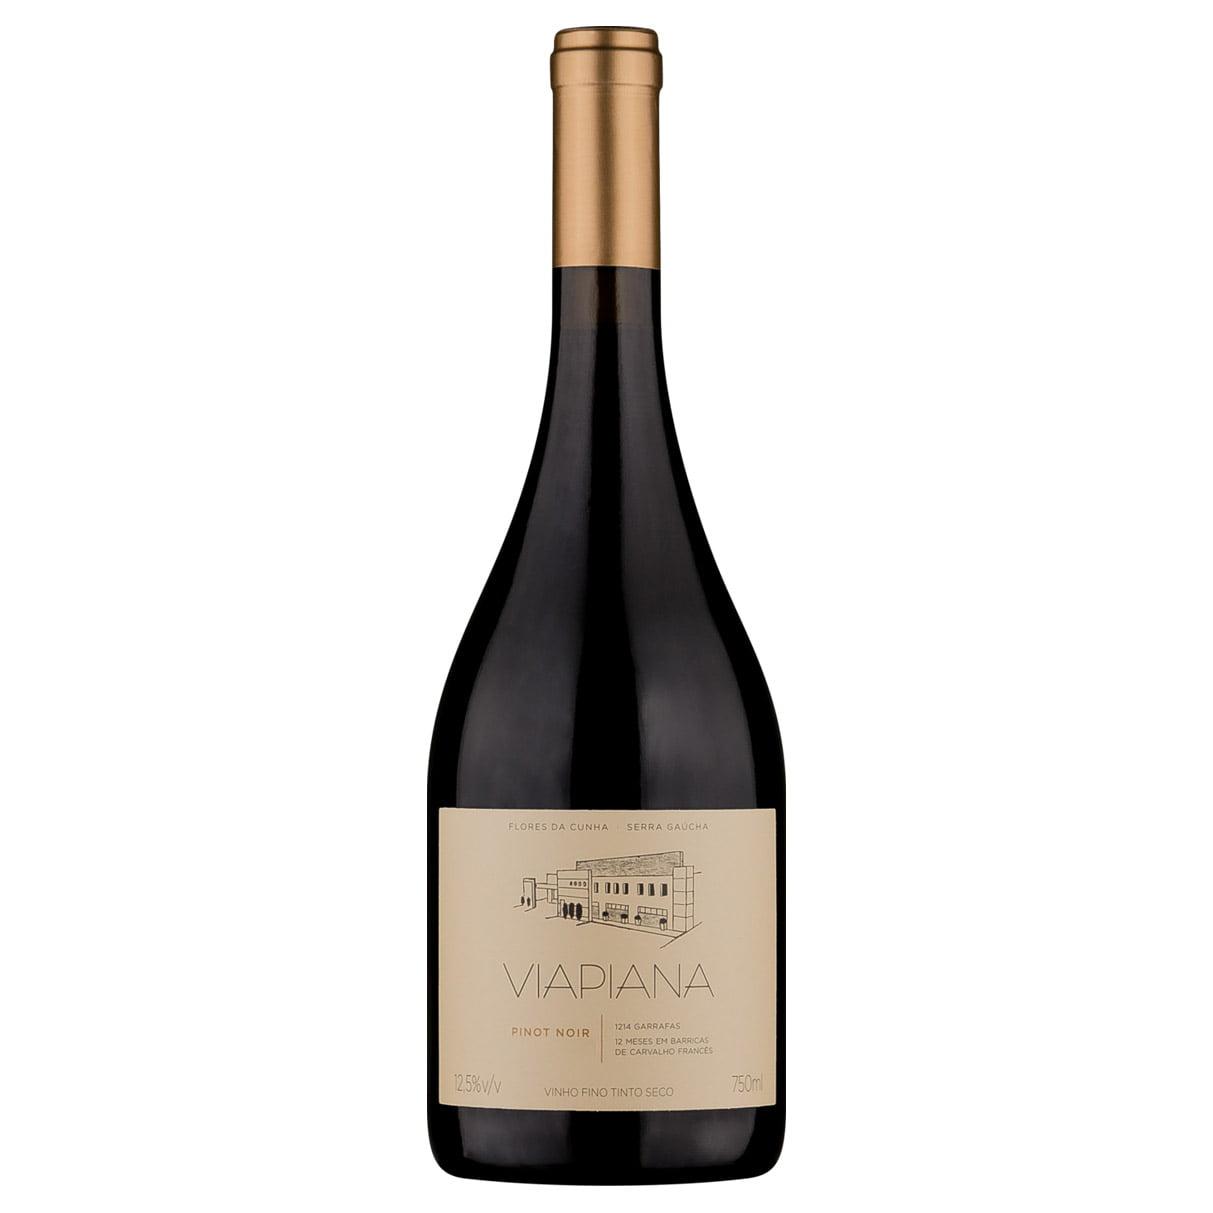 Viapiana Pinot Noir 2019